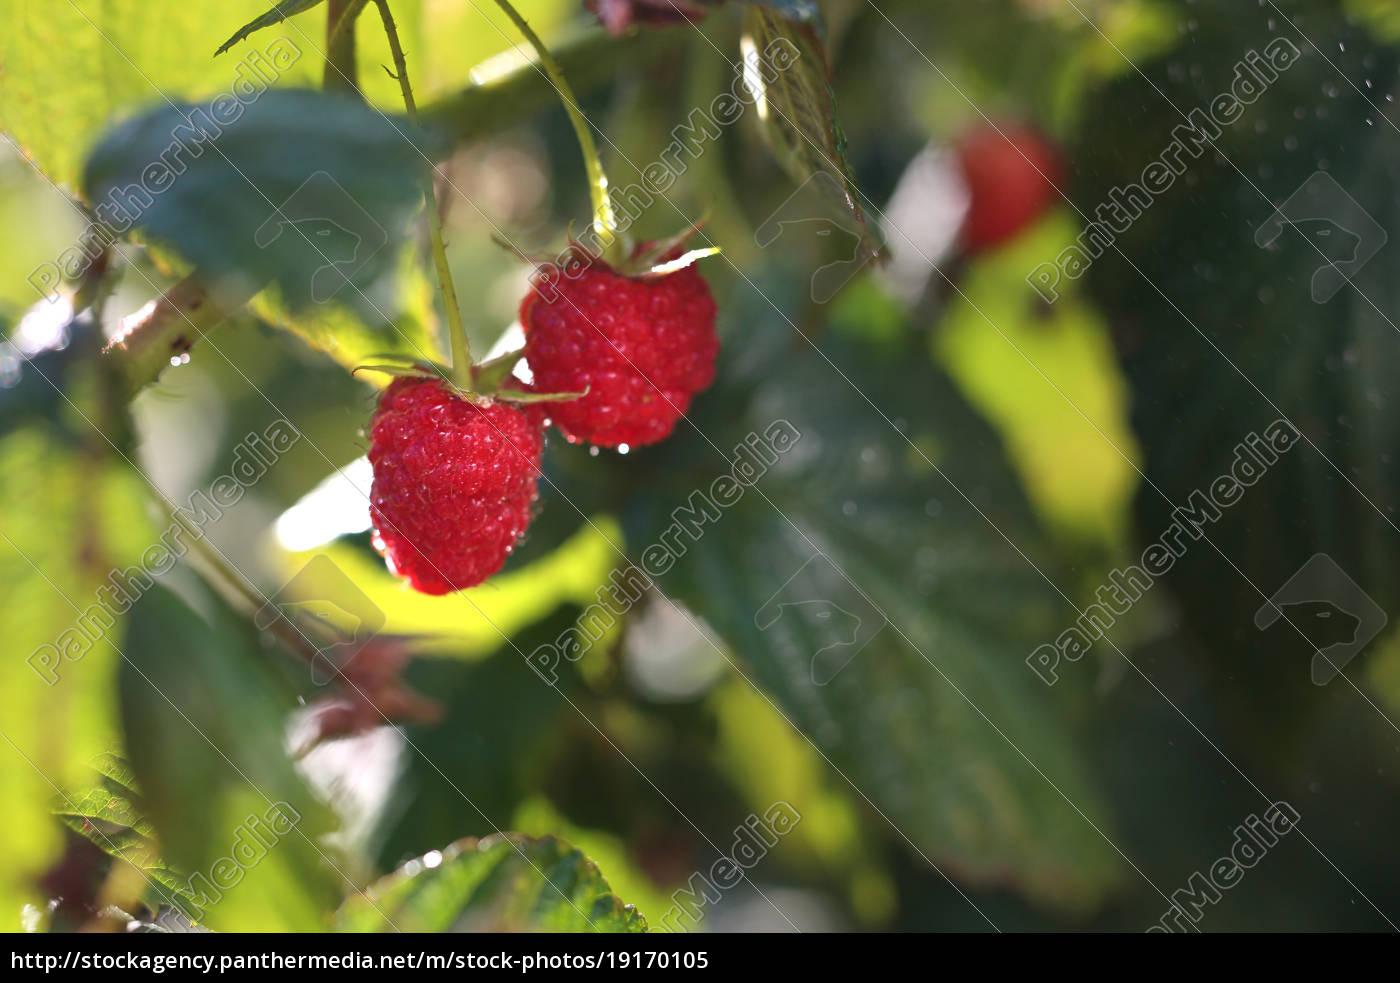 raspberries., shrubs, of, raspberries. - 19170105